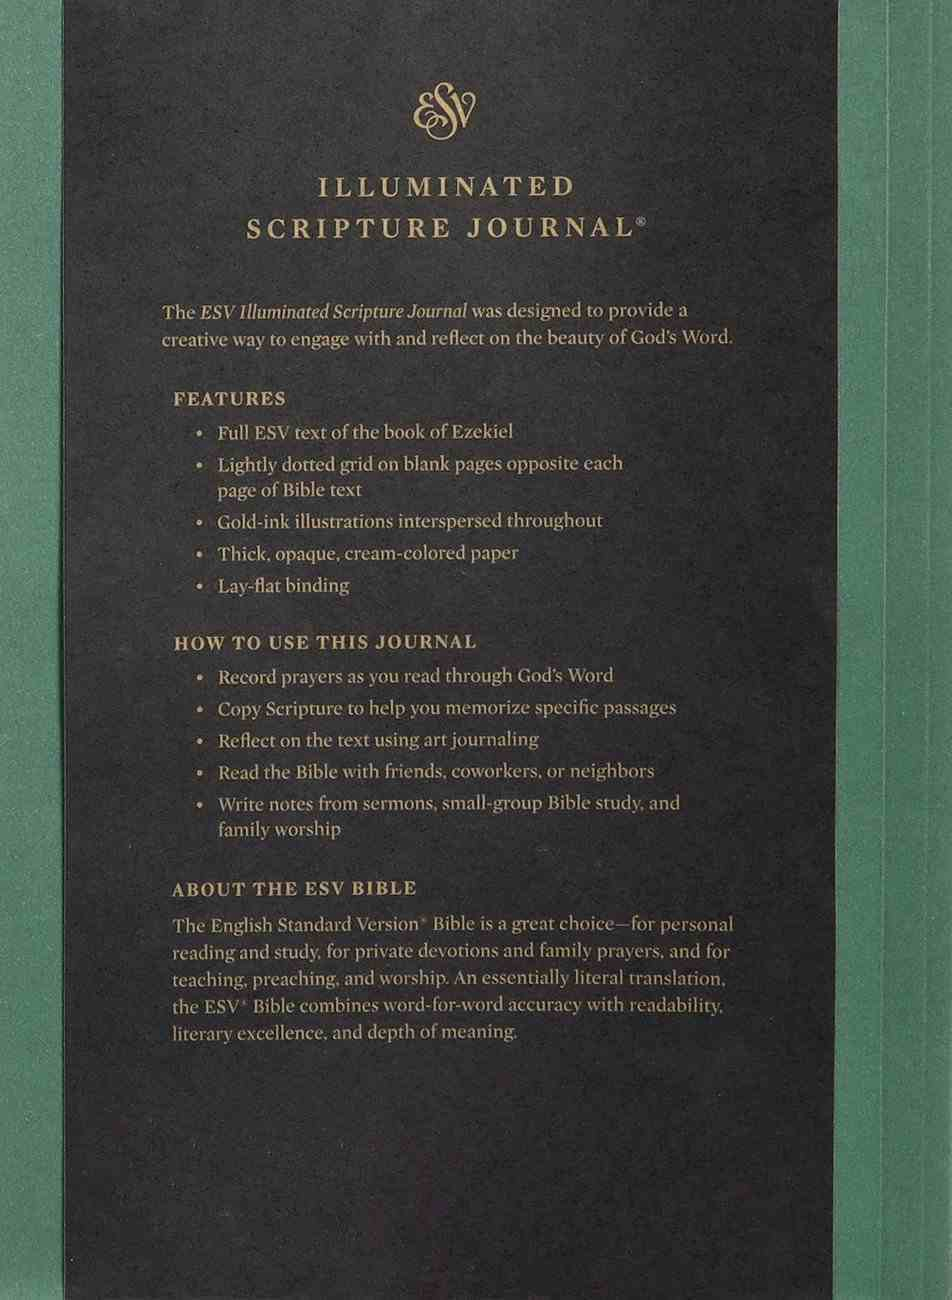 ESV Illuminated Scripture Journal Ezekiel (Black Letter Edition) Paperback